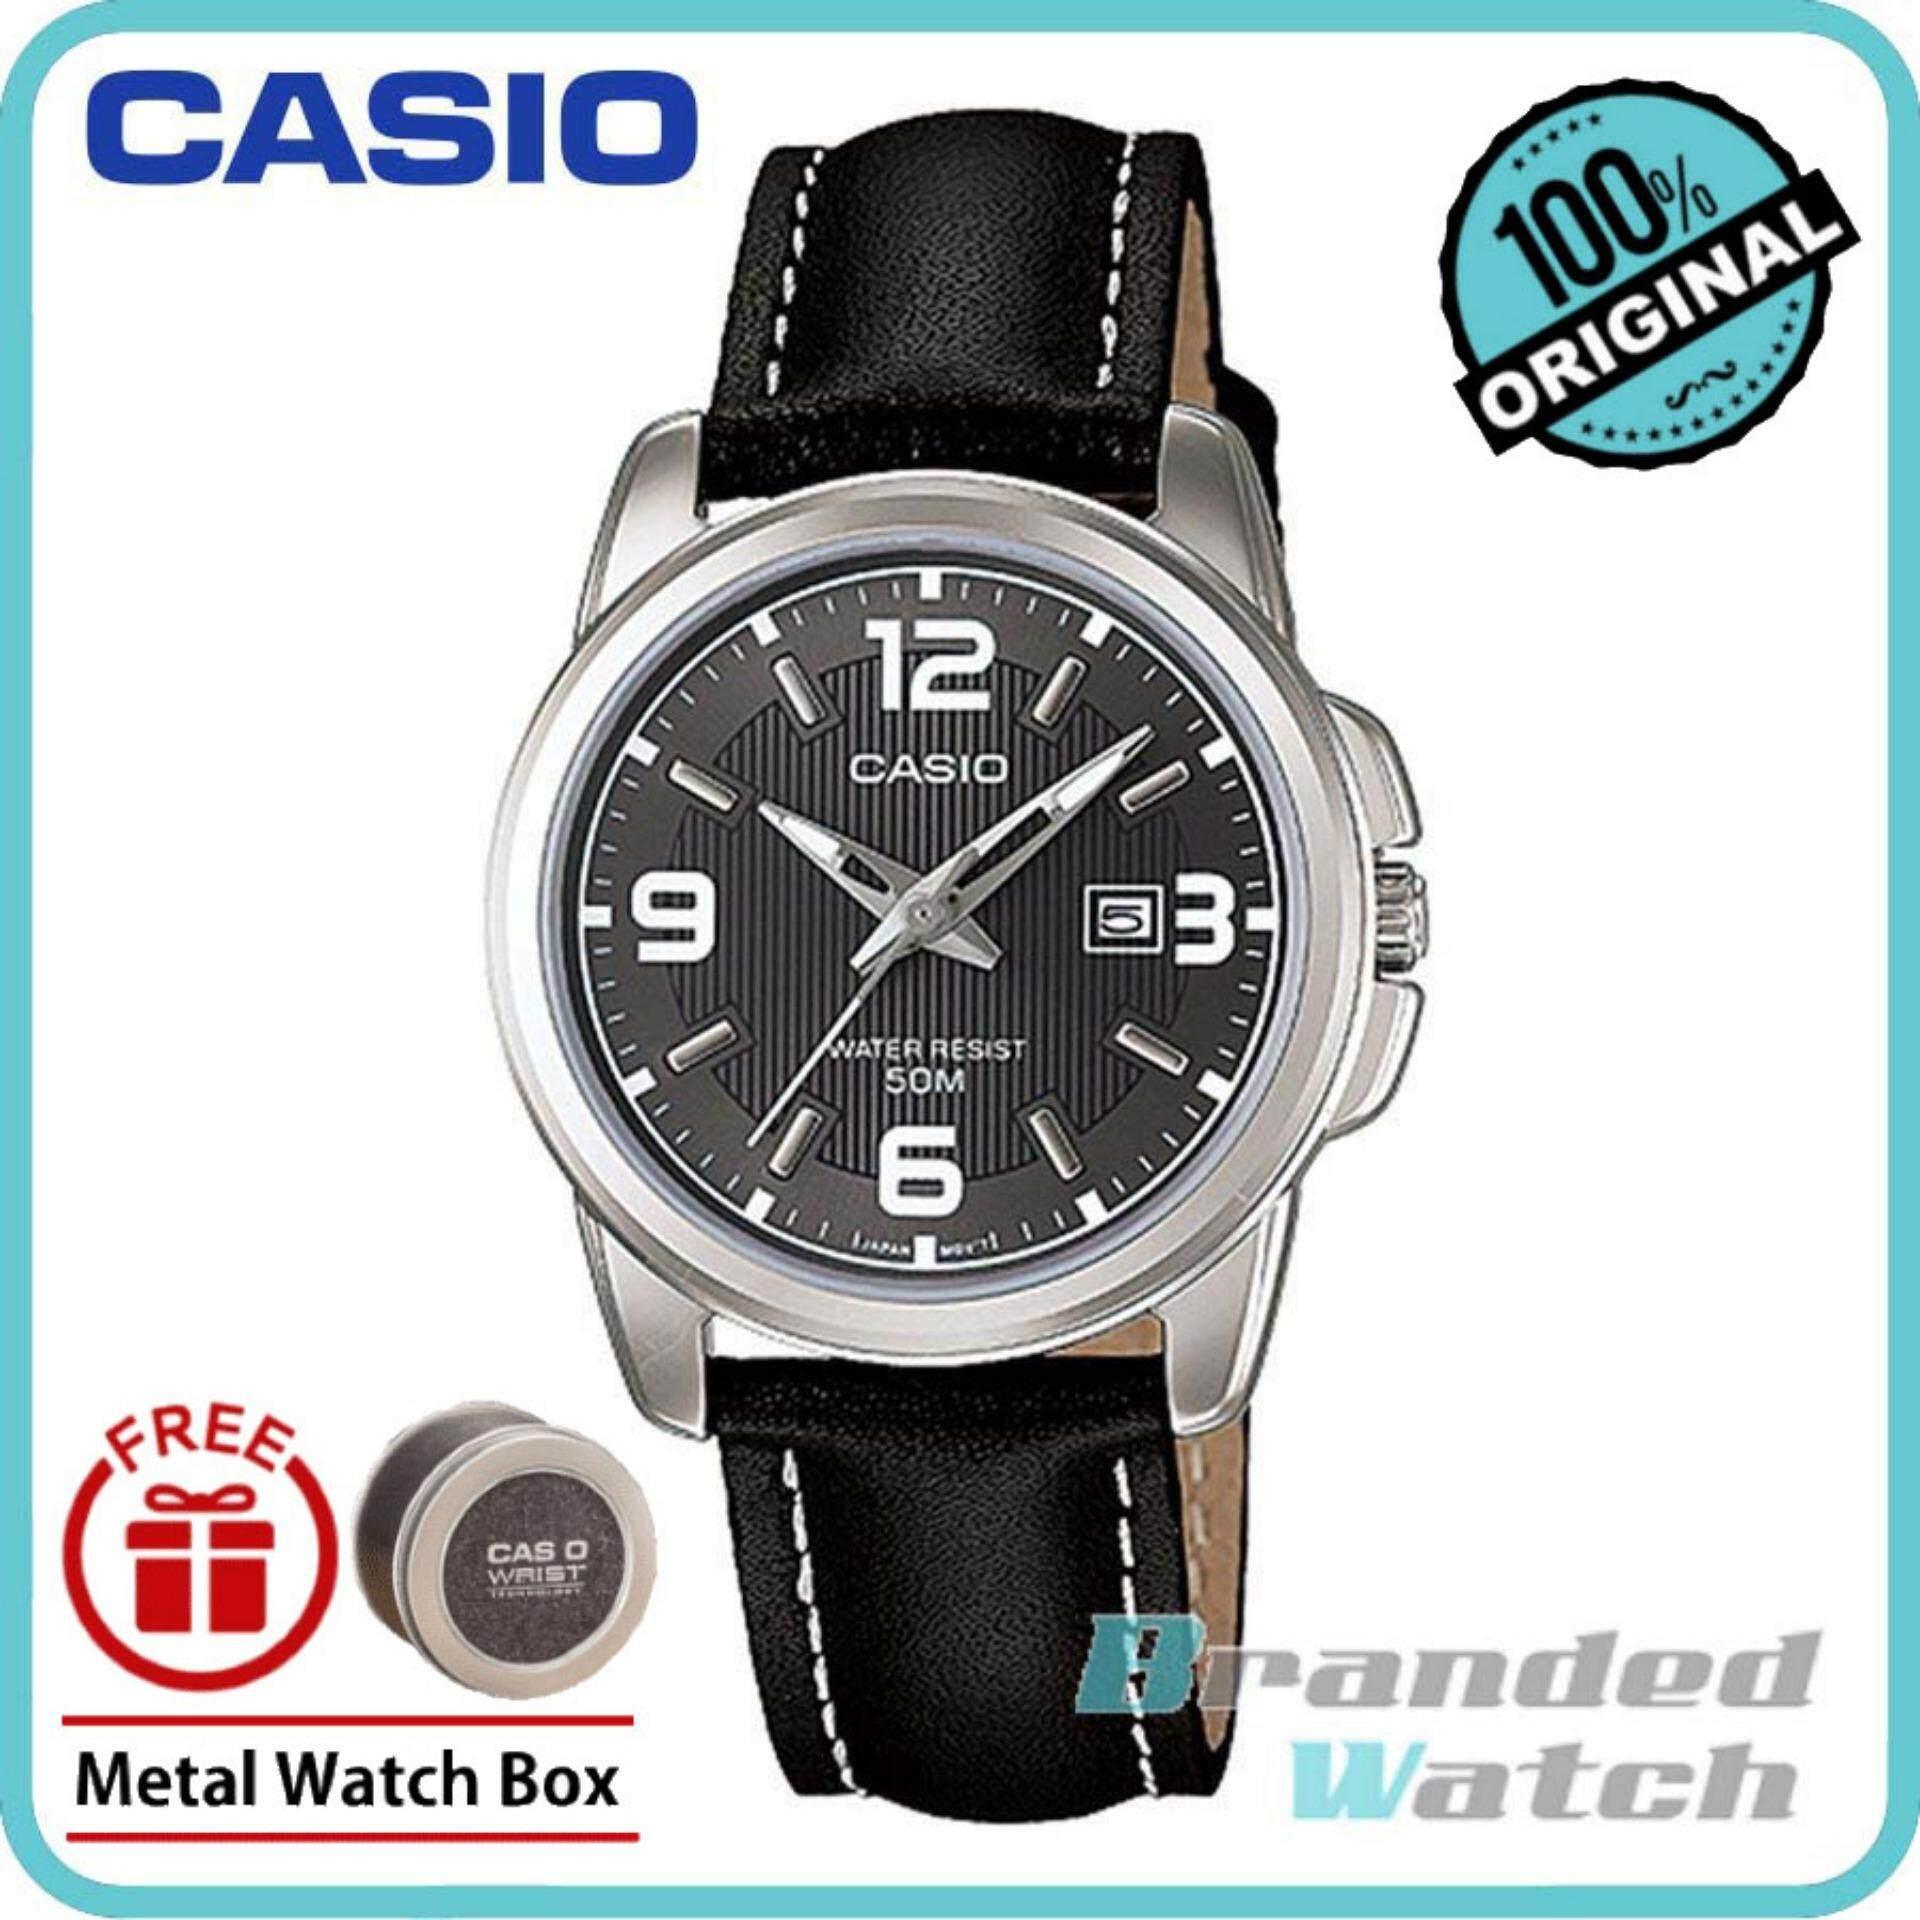 Casio LTP-1314L-8AVDF Women's Analog Date Display Steel Watch LTP-1314L-